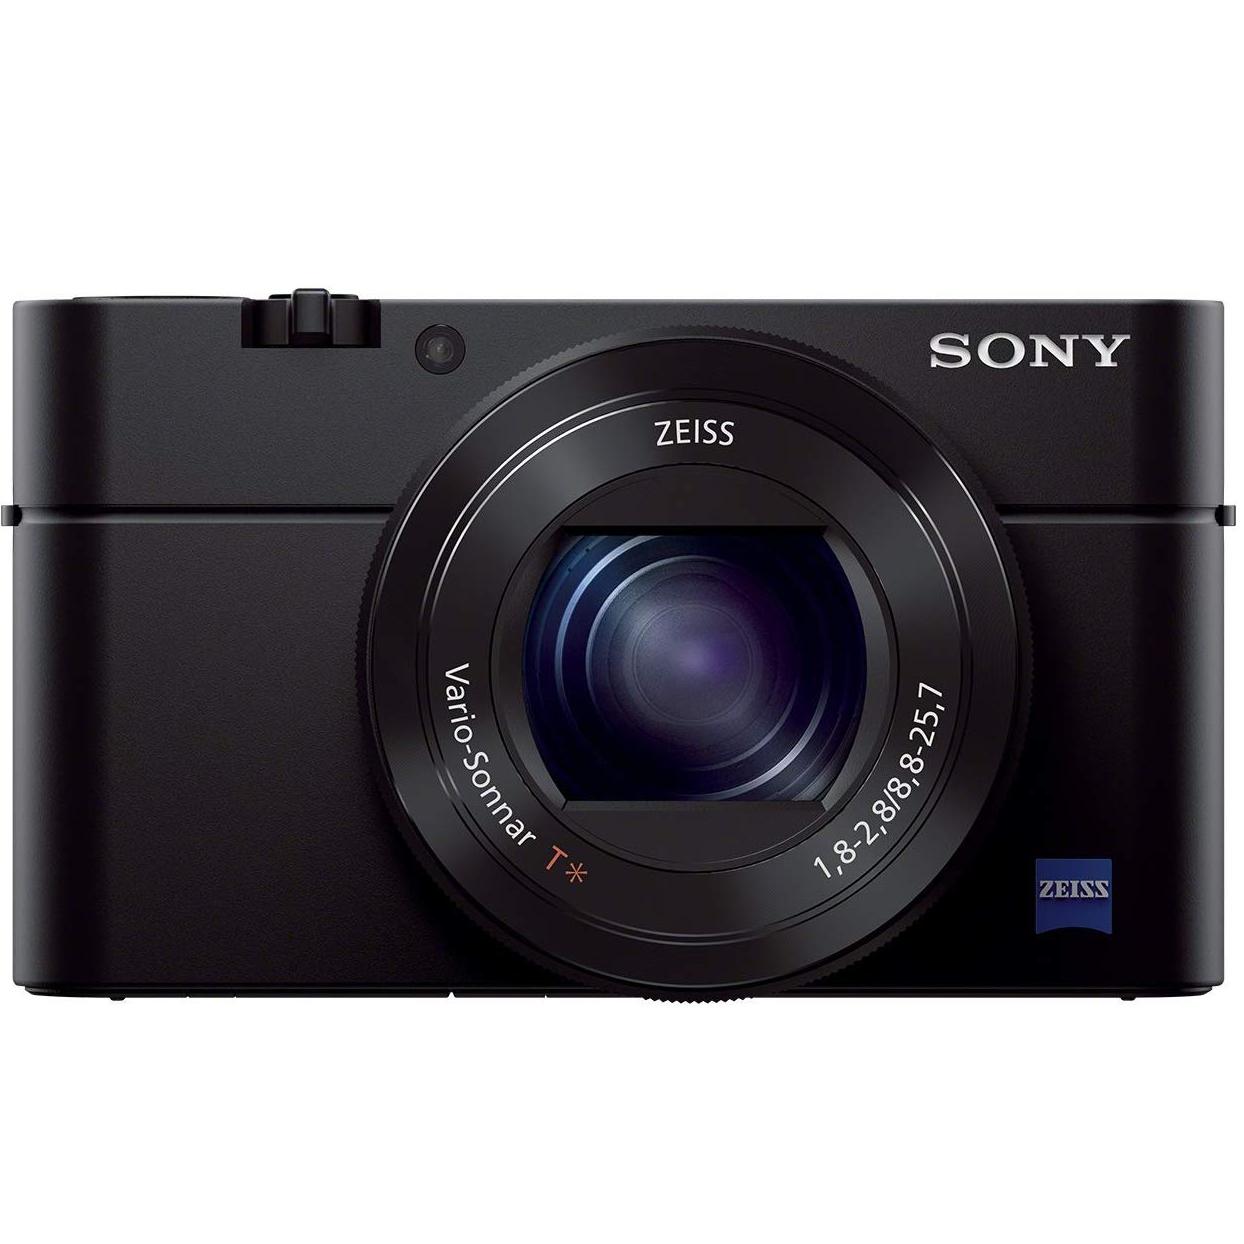 Sony RX100 III Advanced Compact Premium Camera with 1.0-Type Sensor, 24-70 mm F1.8-2.8 Zeiss Lens (DSC-RX100M3) - Black @ Amazon £349